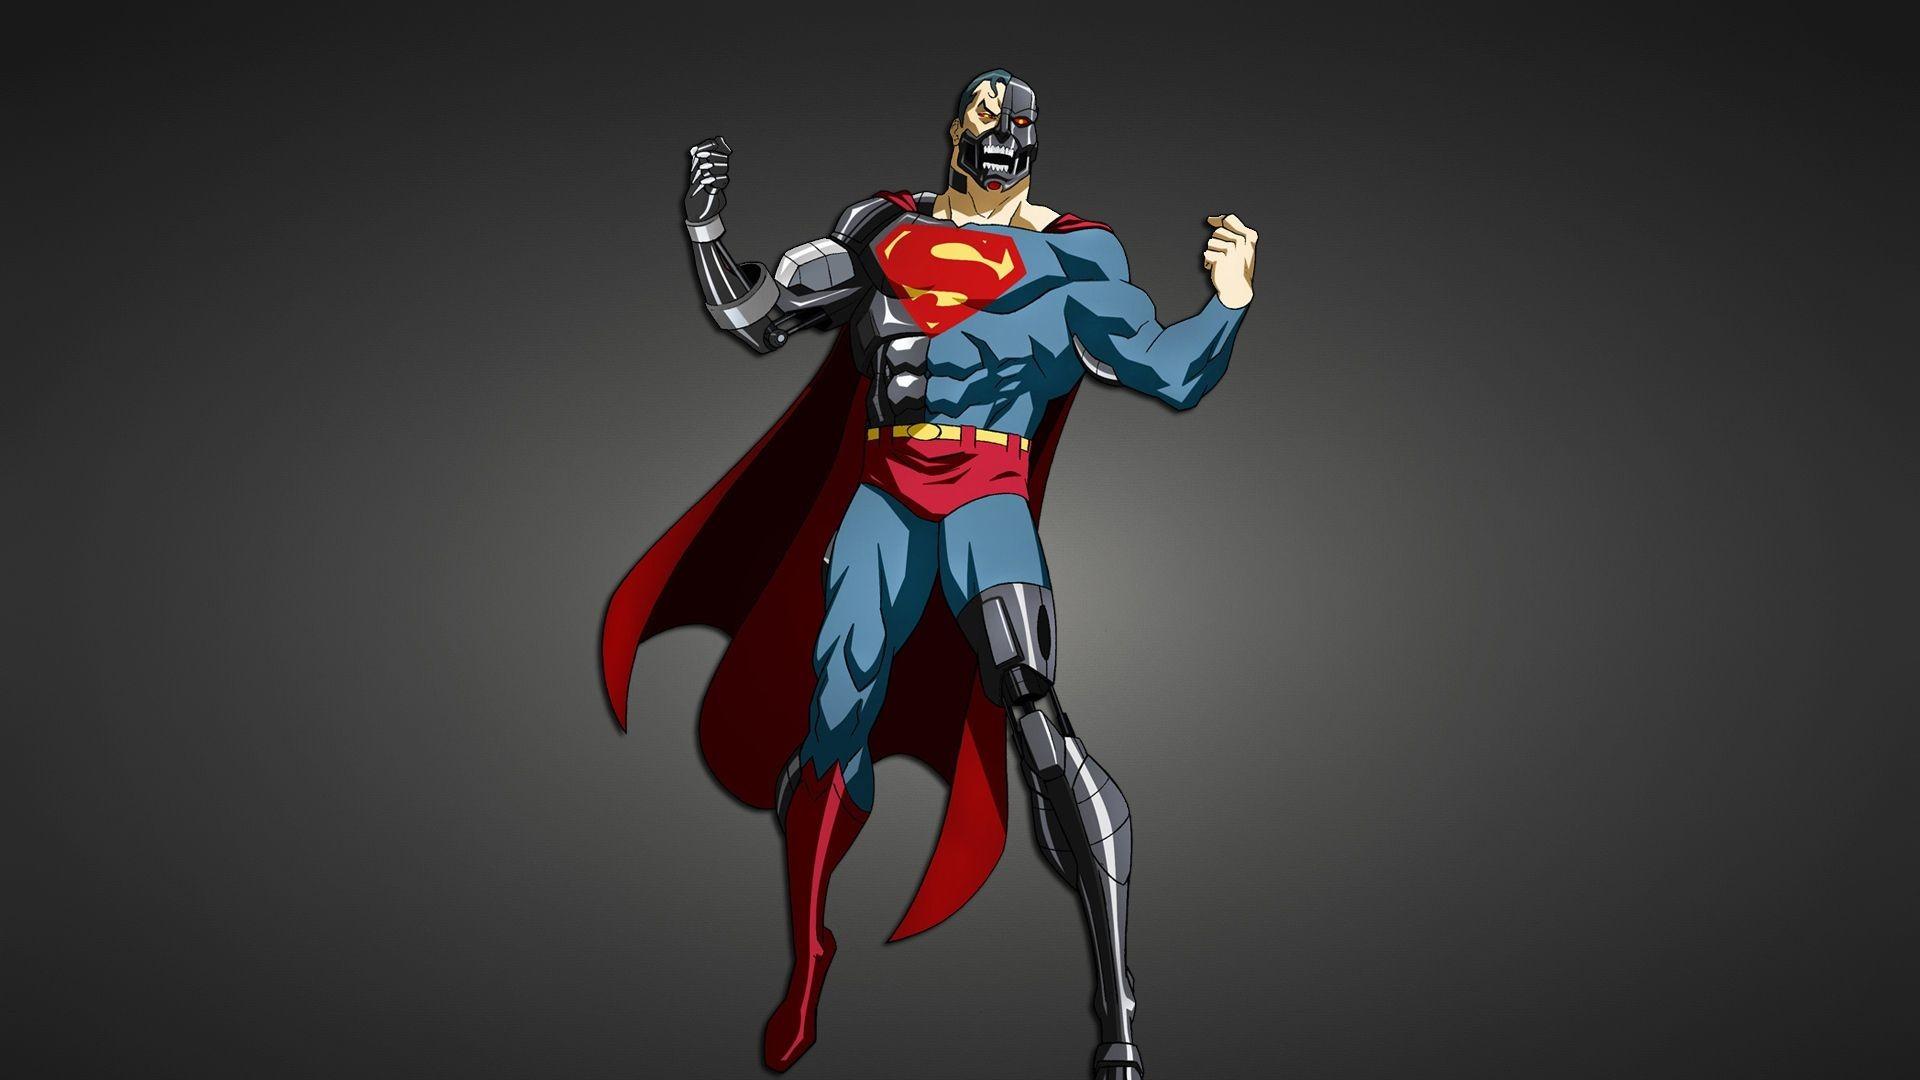 Full HD 1080p Superman Wallpapers HD, Desktop Backgrounds 1920×1080